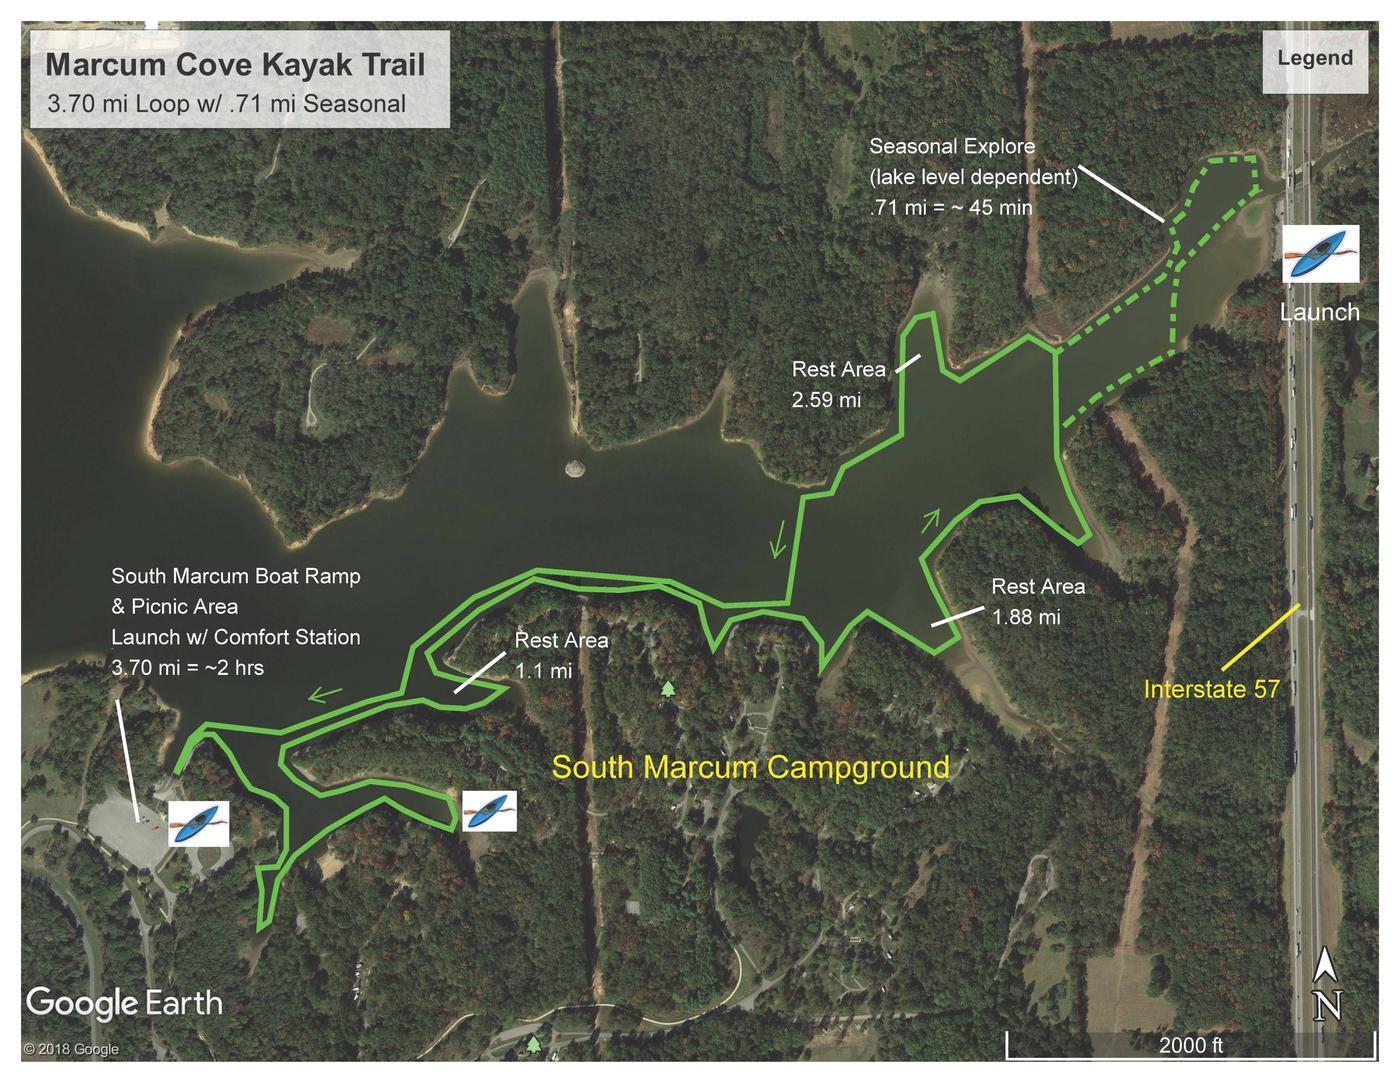 Marcum Cove Kayak Trail